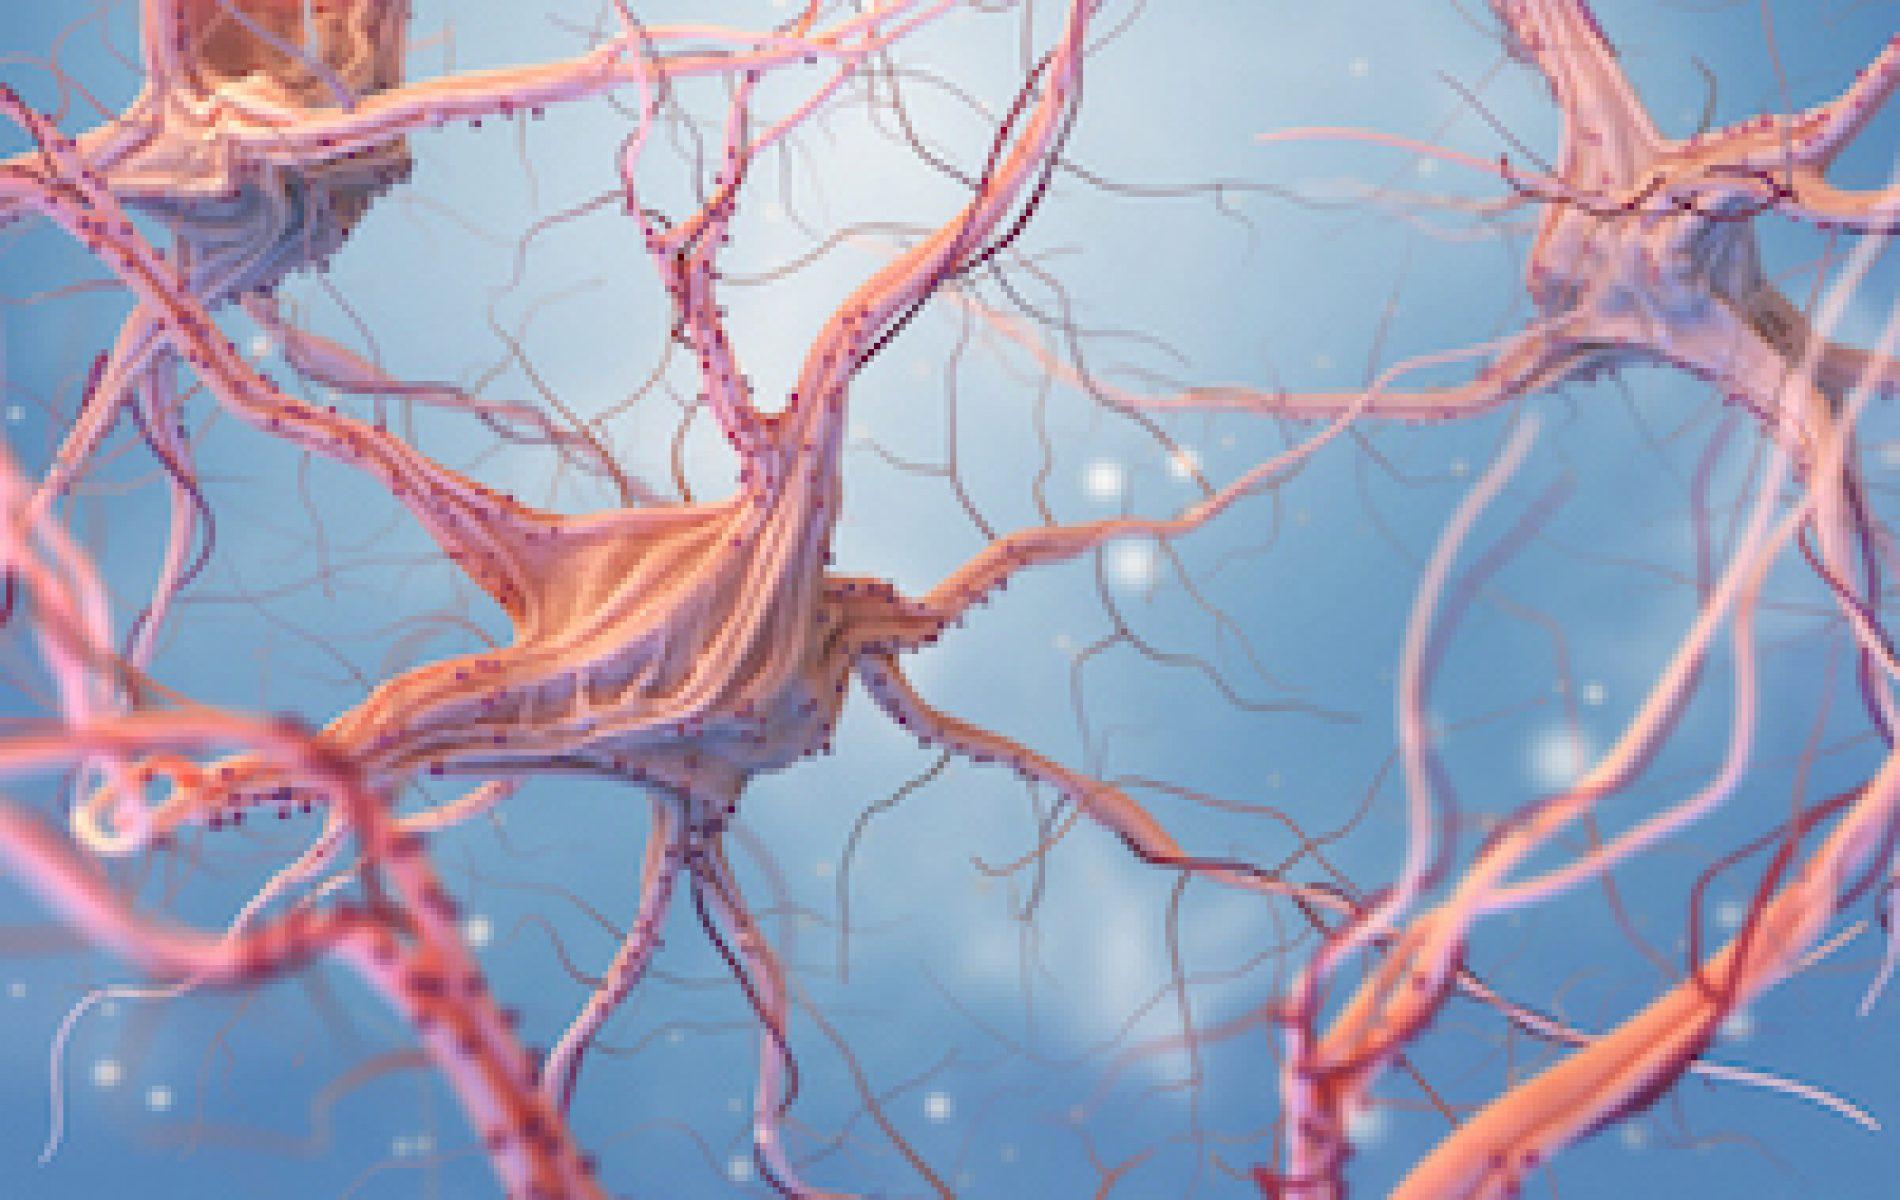 neurons firing in a brain